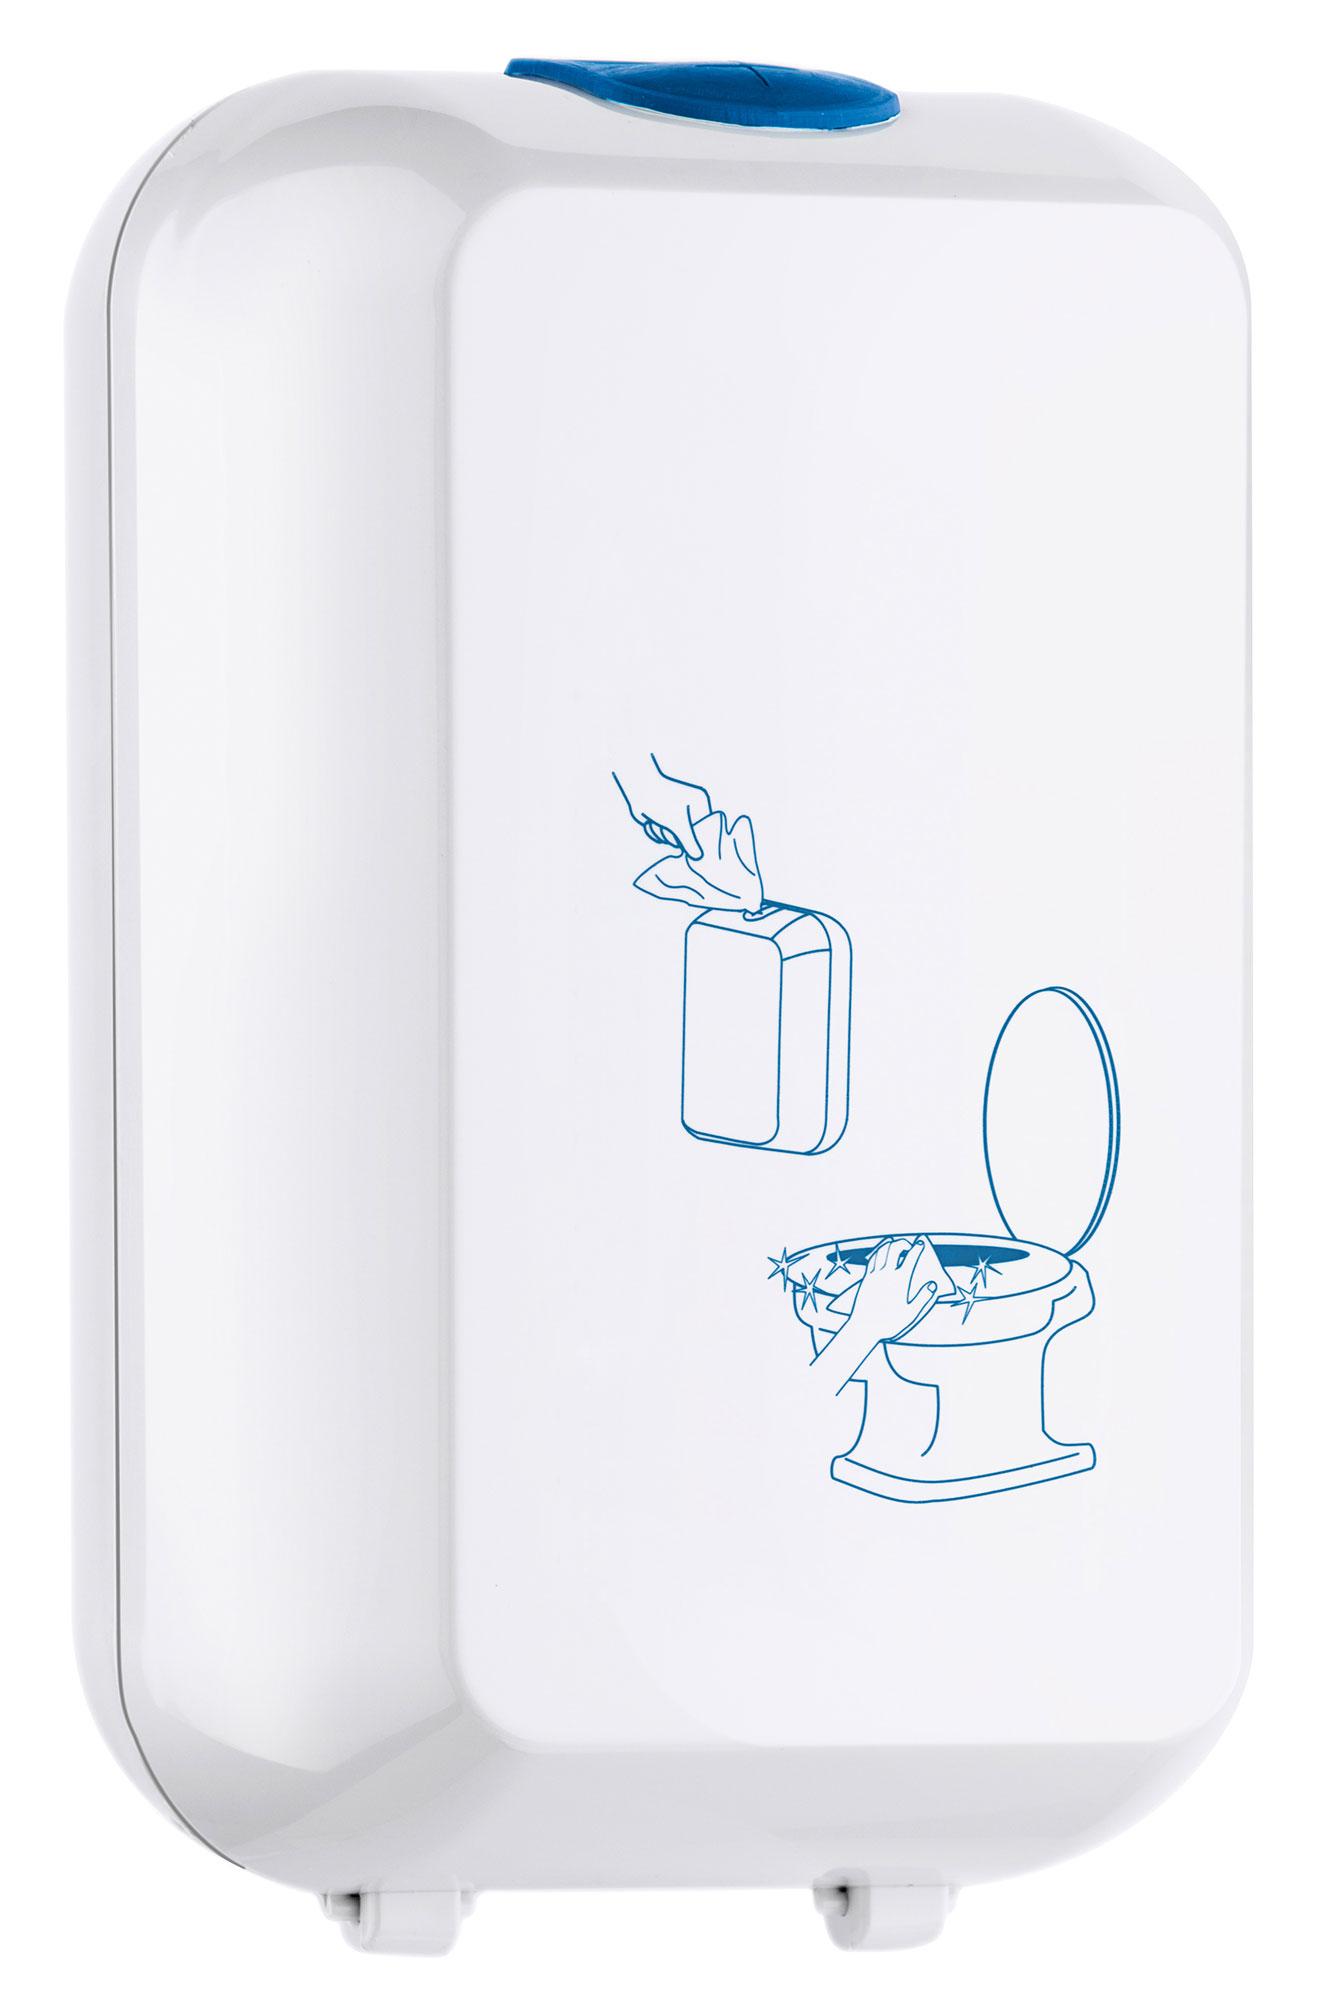 Toiletseat hygiene